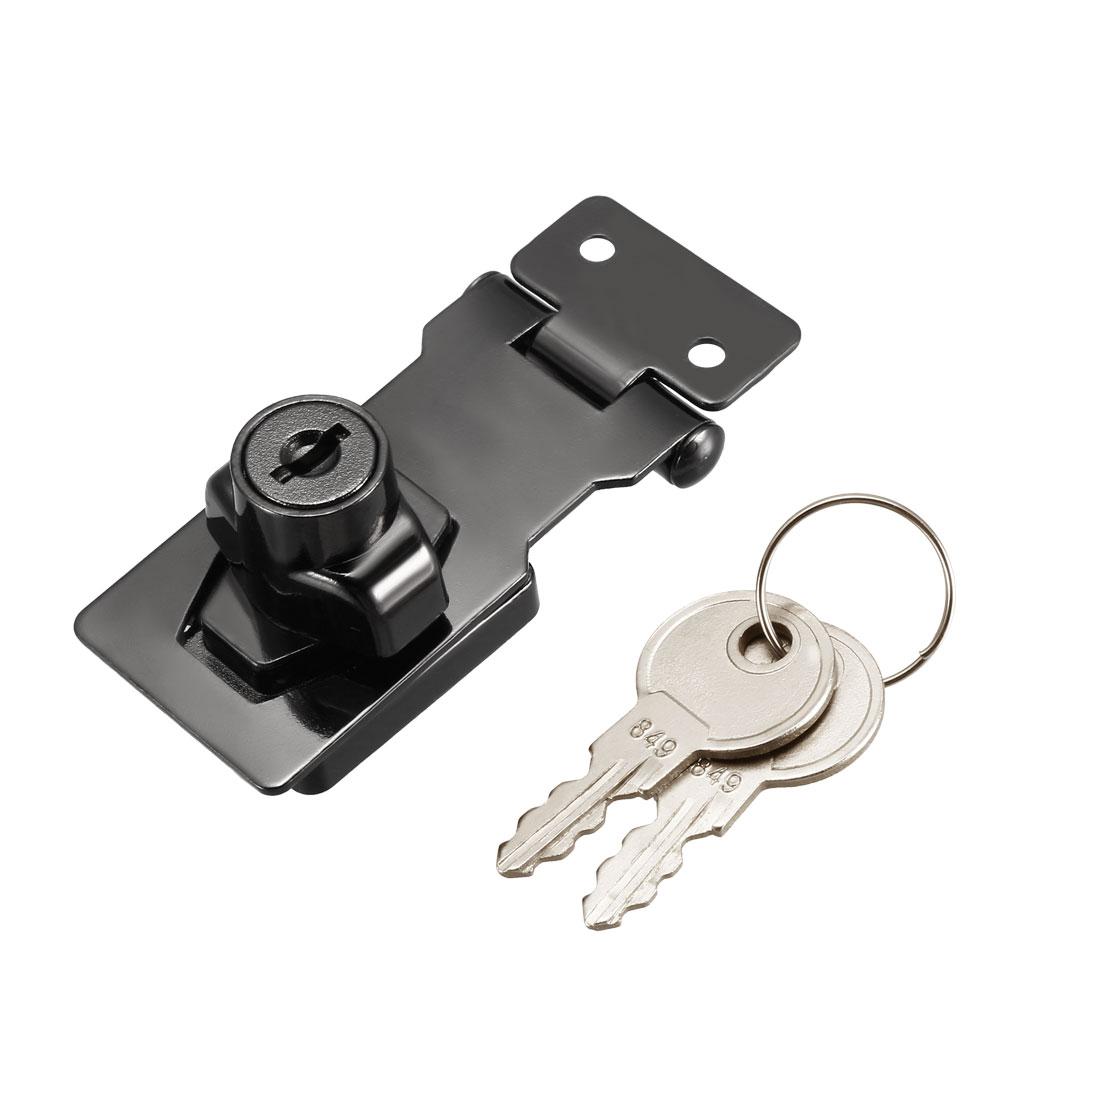 Keyed Hasp Lock 81mm Twist Knob Keyed Locking Hasp Bright Black